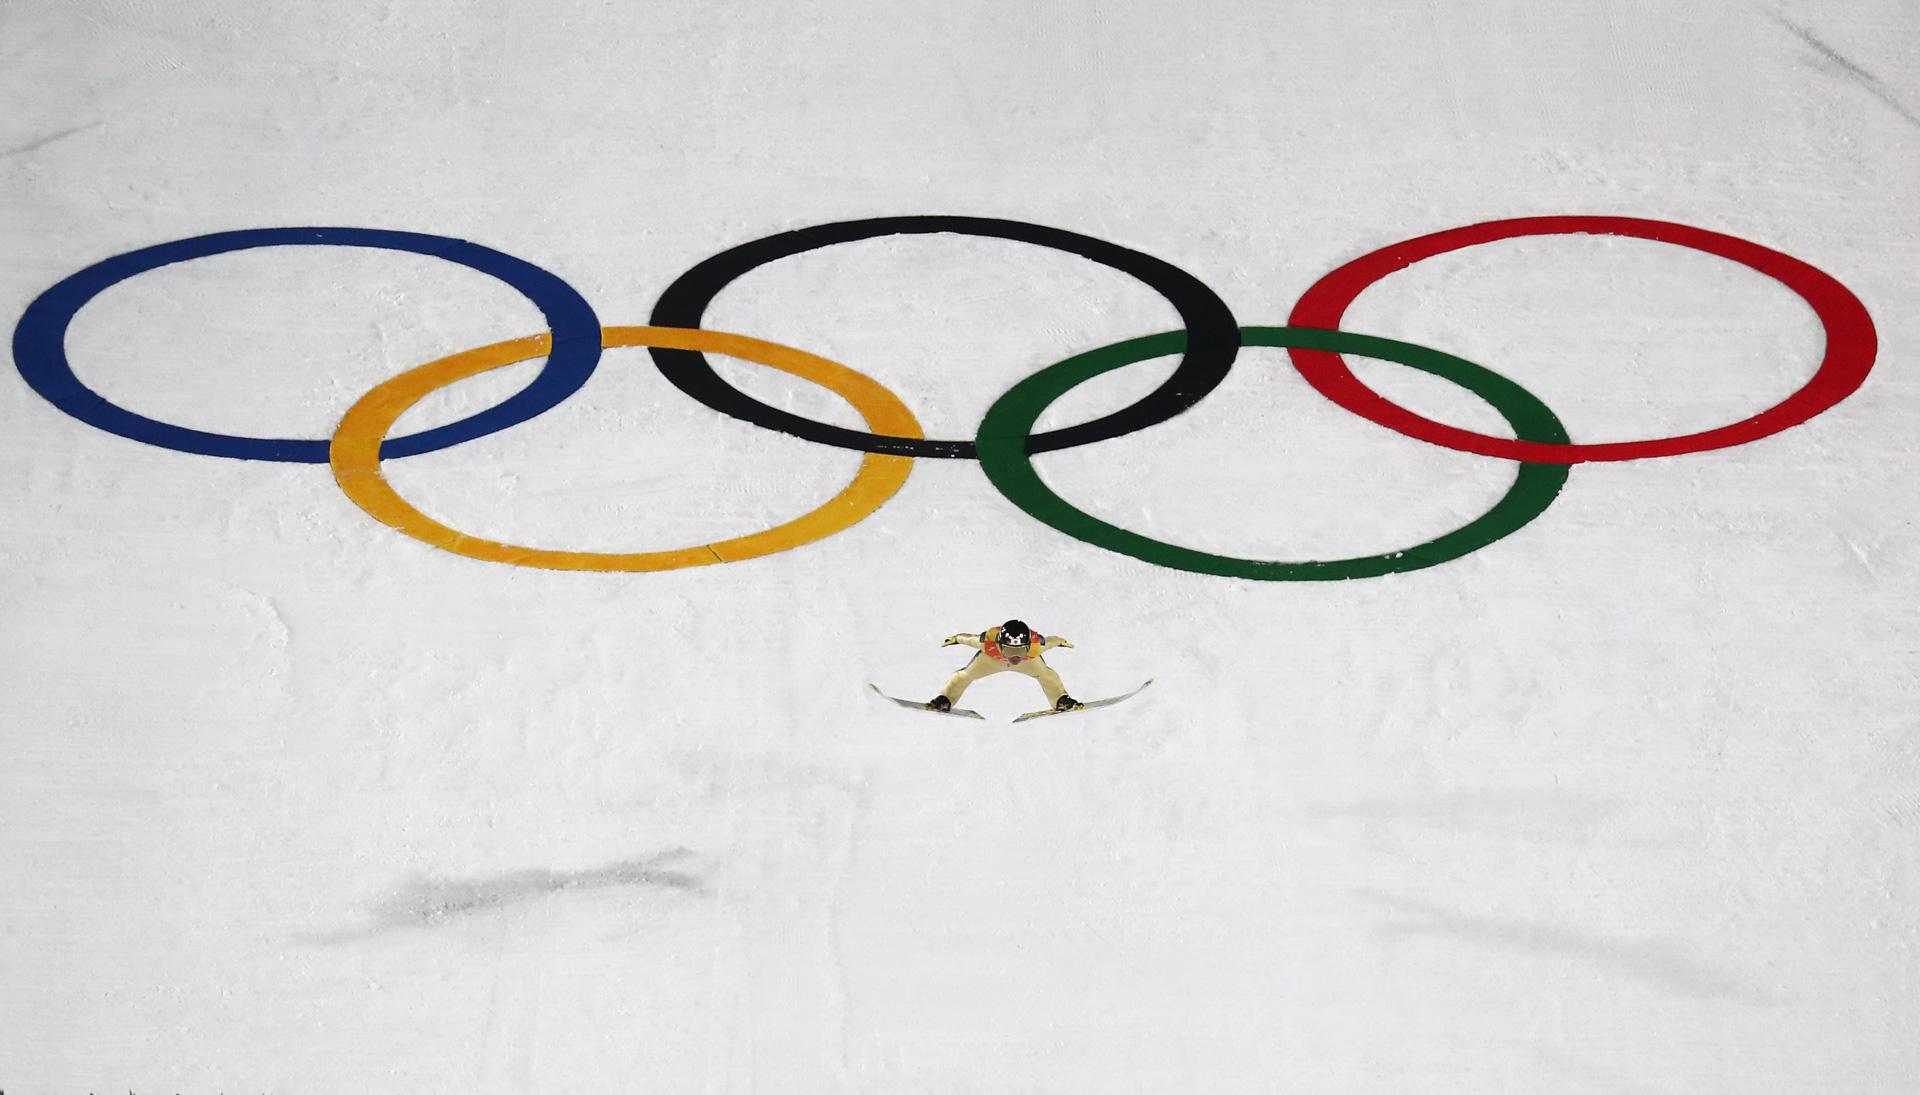 Noriaki Kasai of Japan  during the Ski Jumping - Men's Team Large Hill on day 10 of the PyeongChang 2018 Winter Olympic Games at Alpensia Ski Jumping Center on February 19, 2018 in Pyeongchang-gun, South Korea.